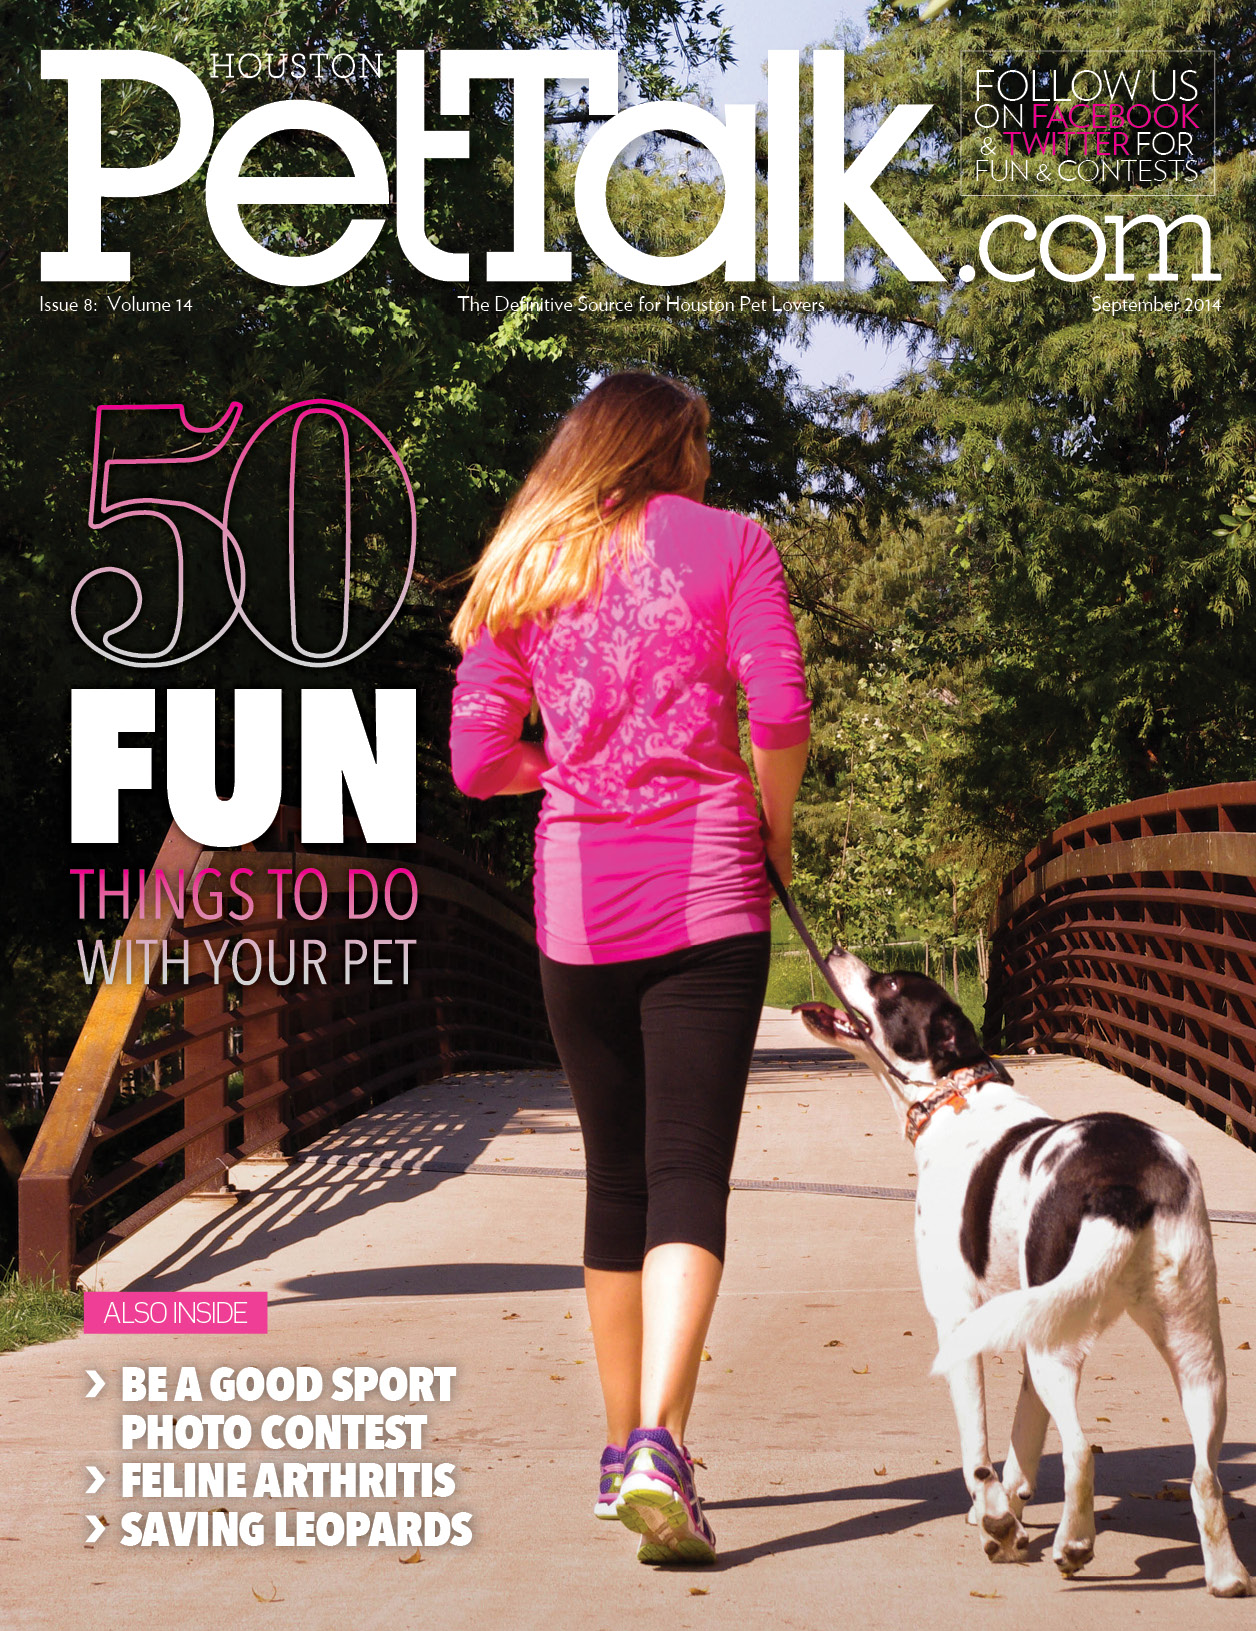 September 2014 Digital Issue of Houston PetTalk